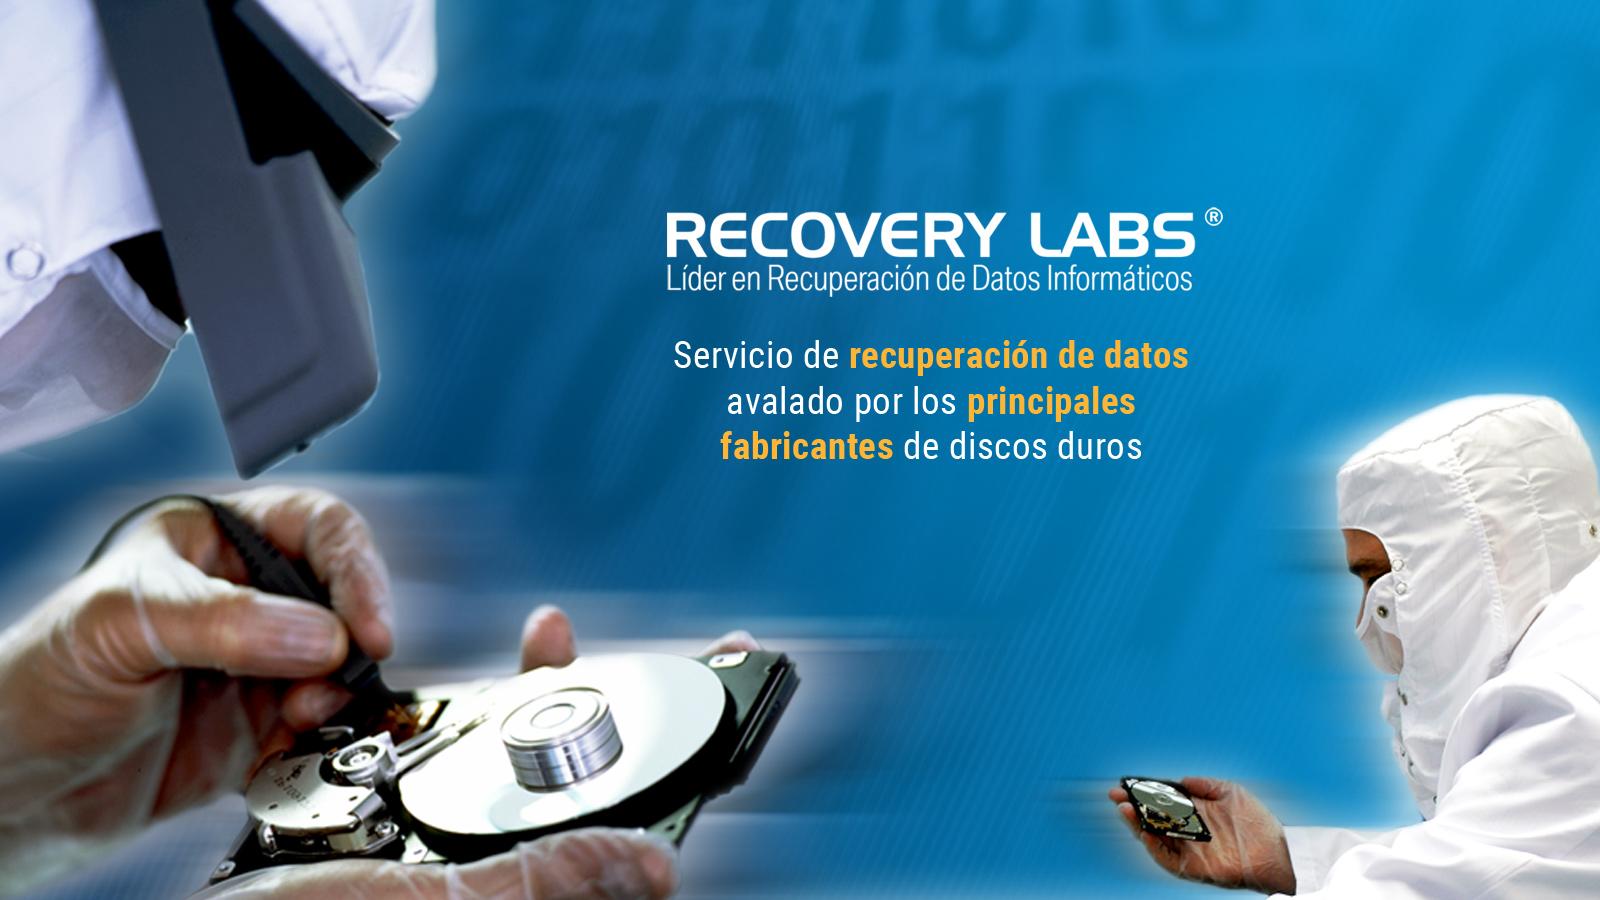 www.recoverylabs.com